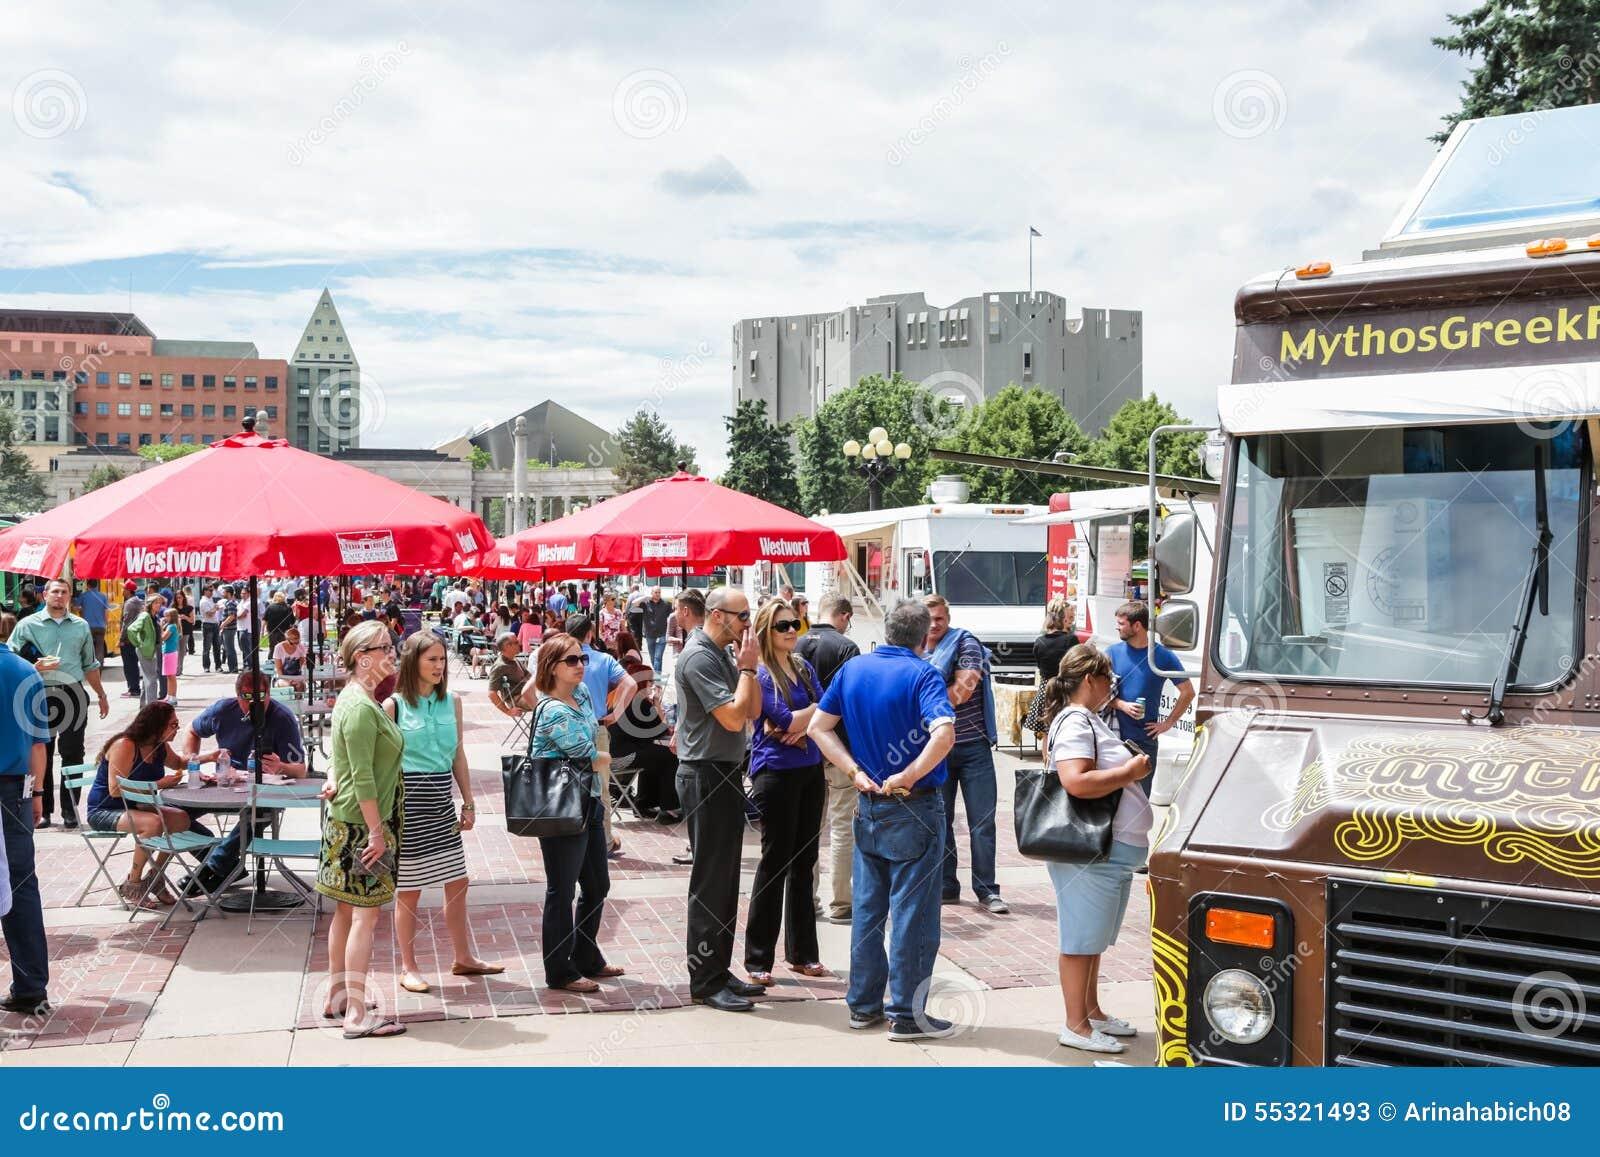 Food Trucks Civic Center